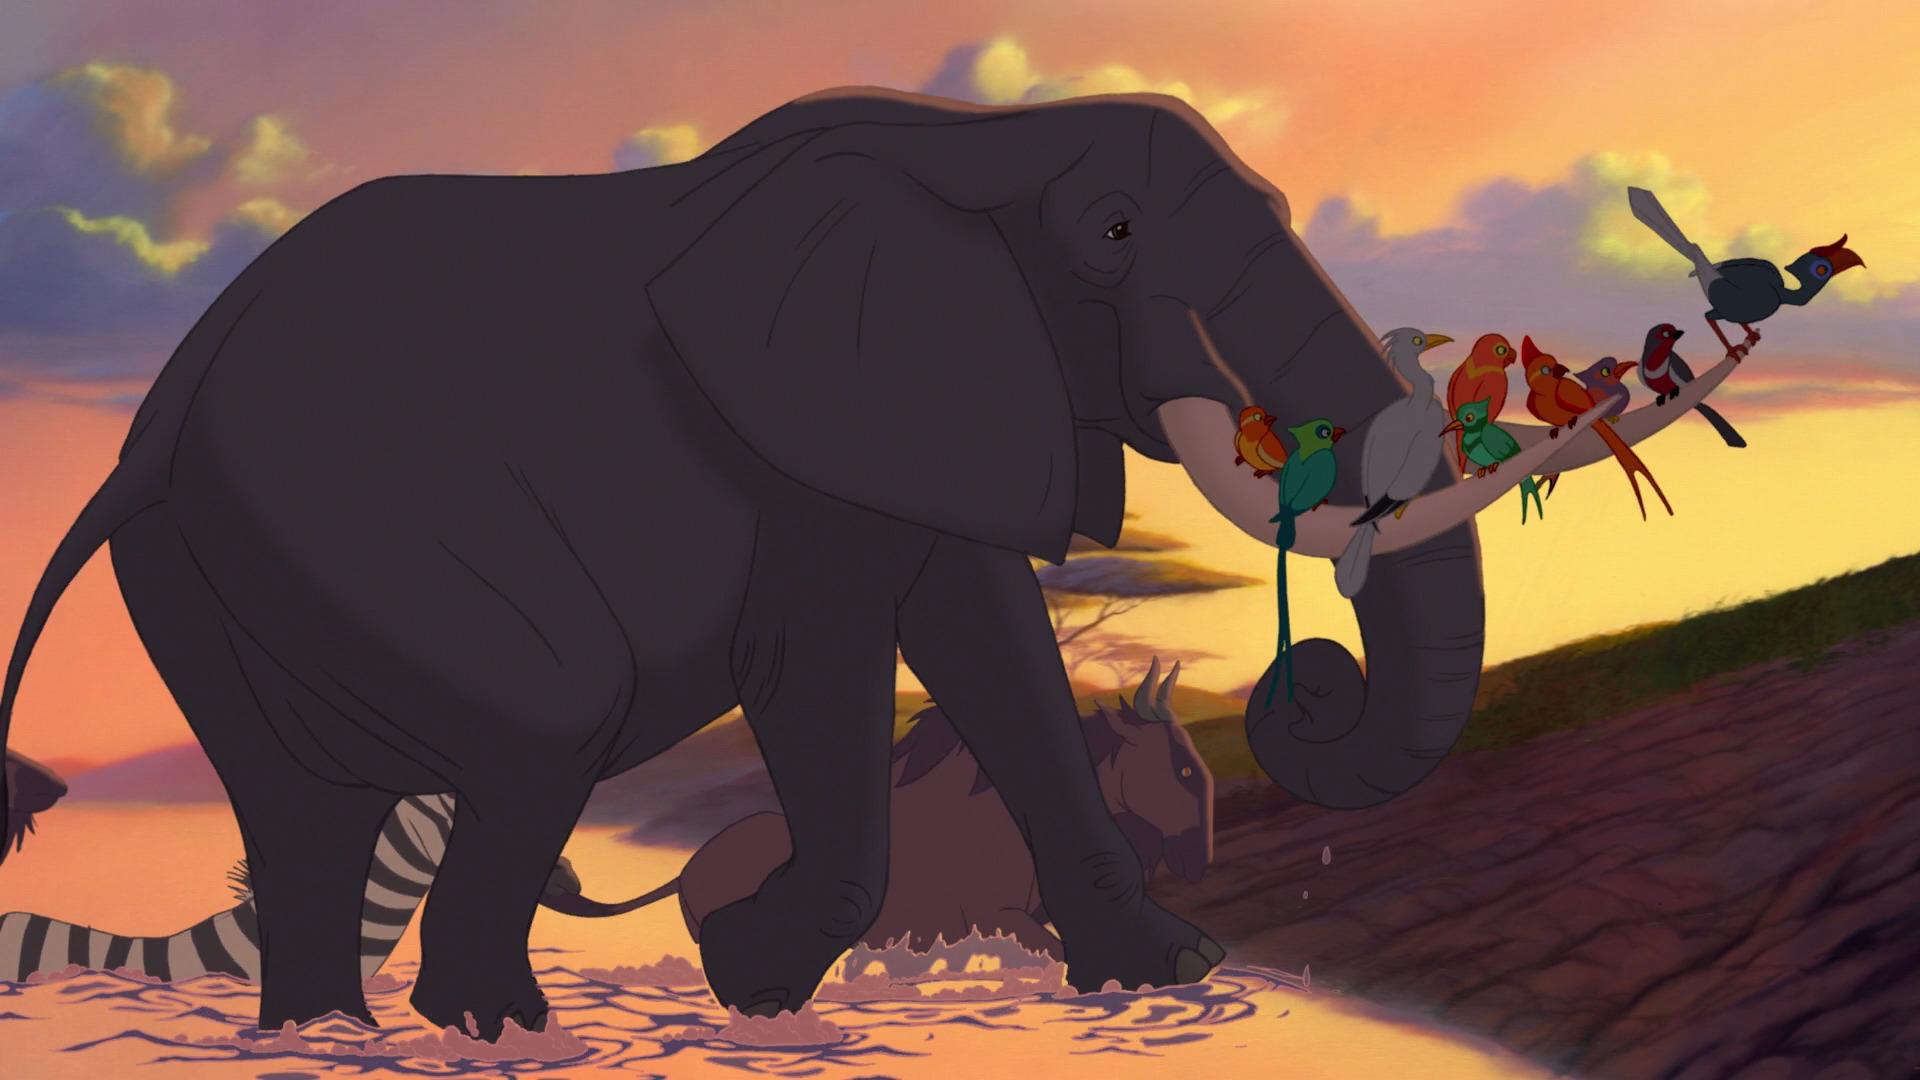 Image Lion King Disneyscreencaps Com 175 Jpg The